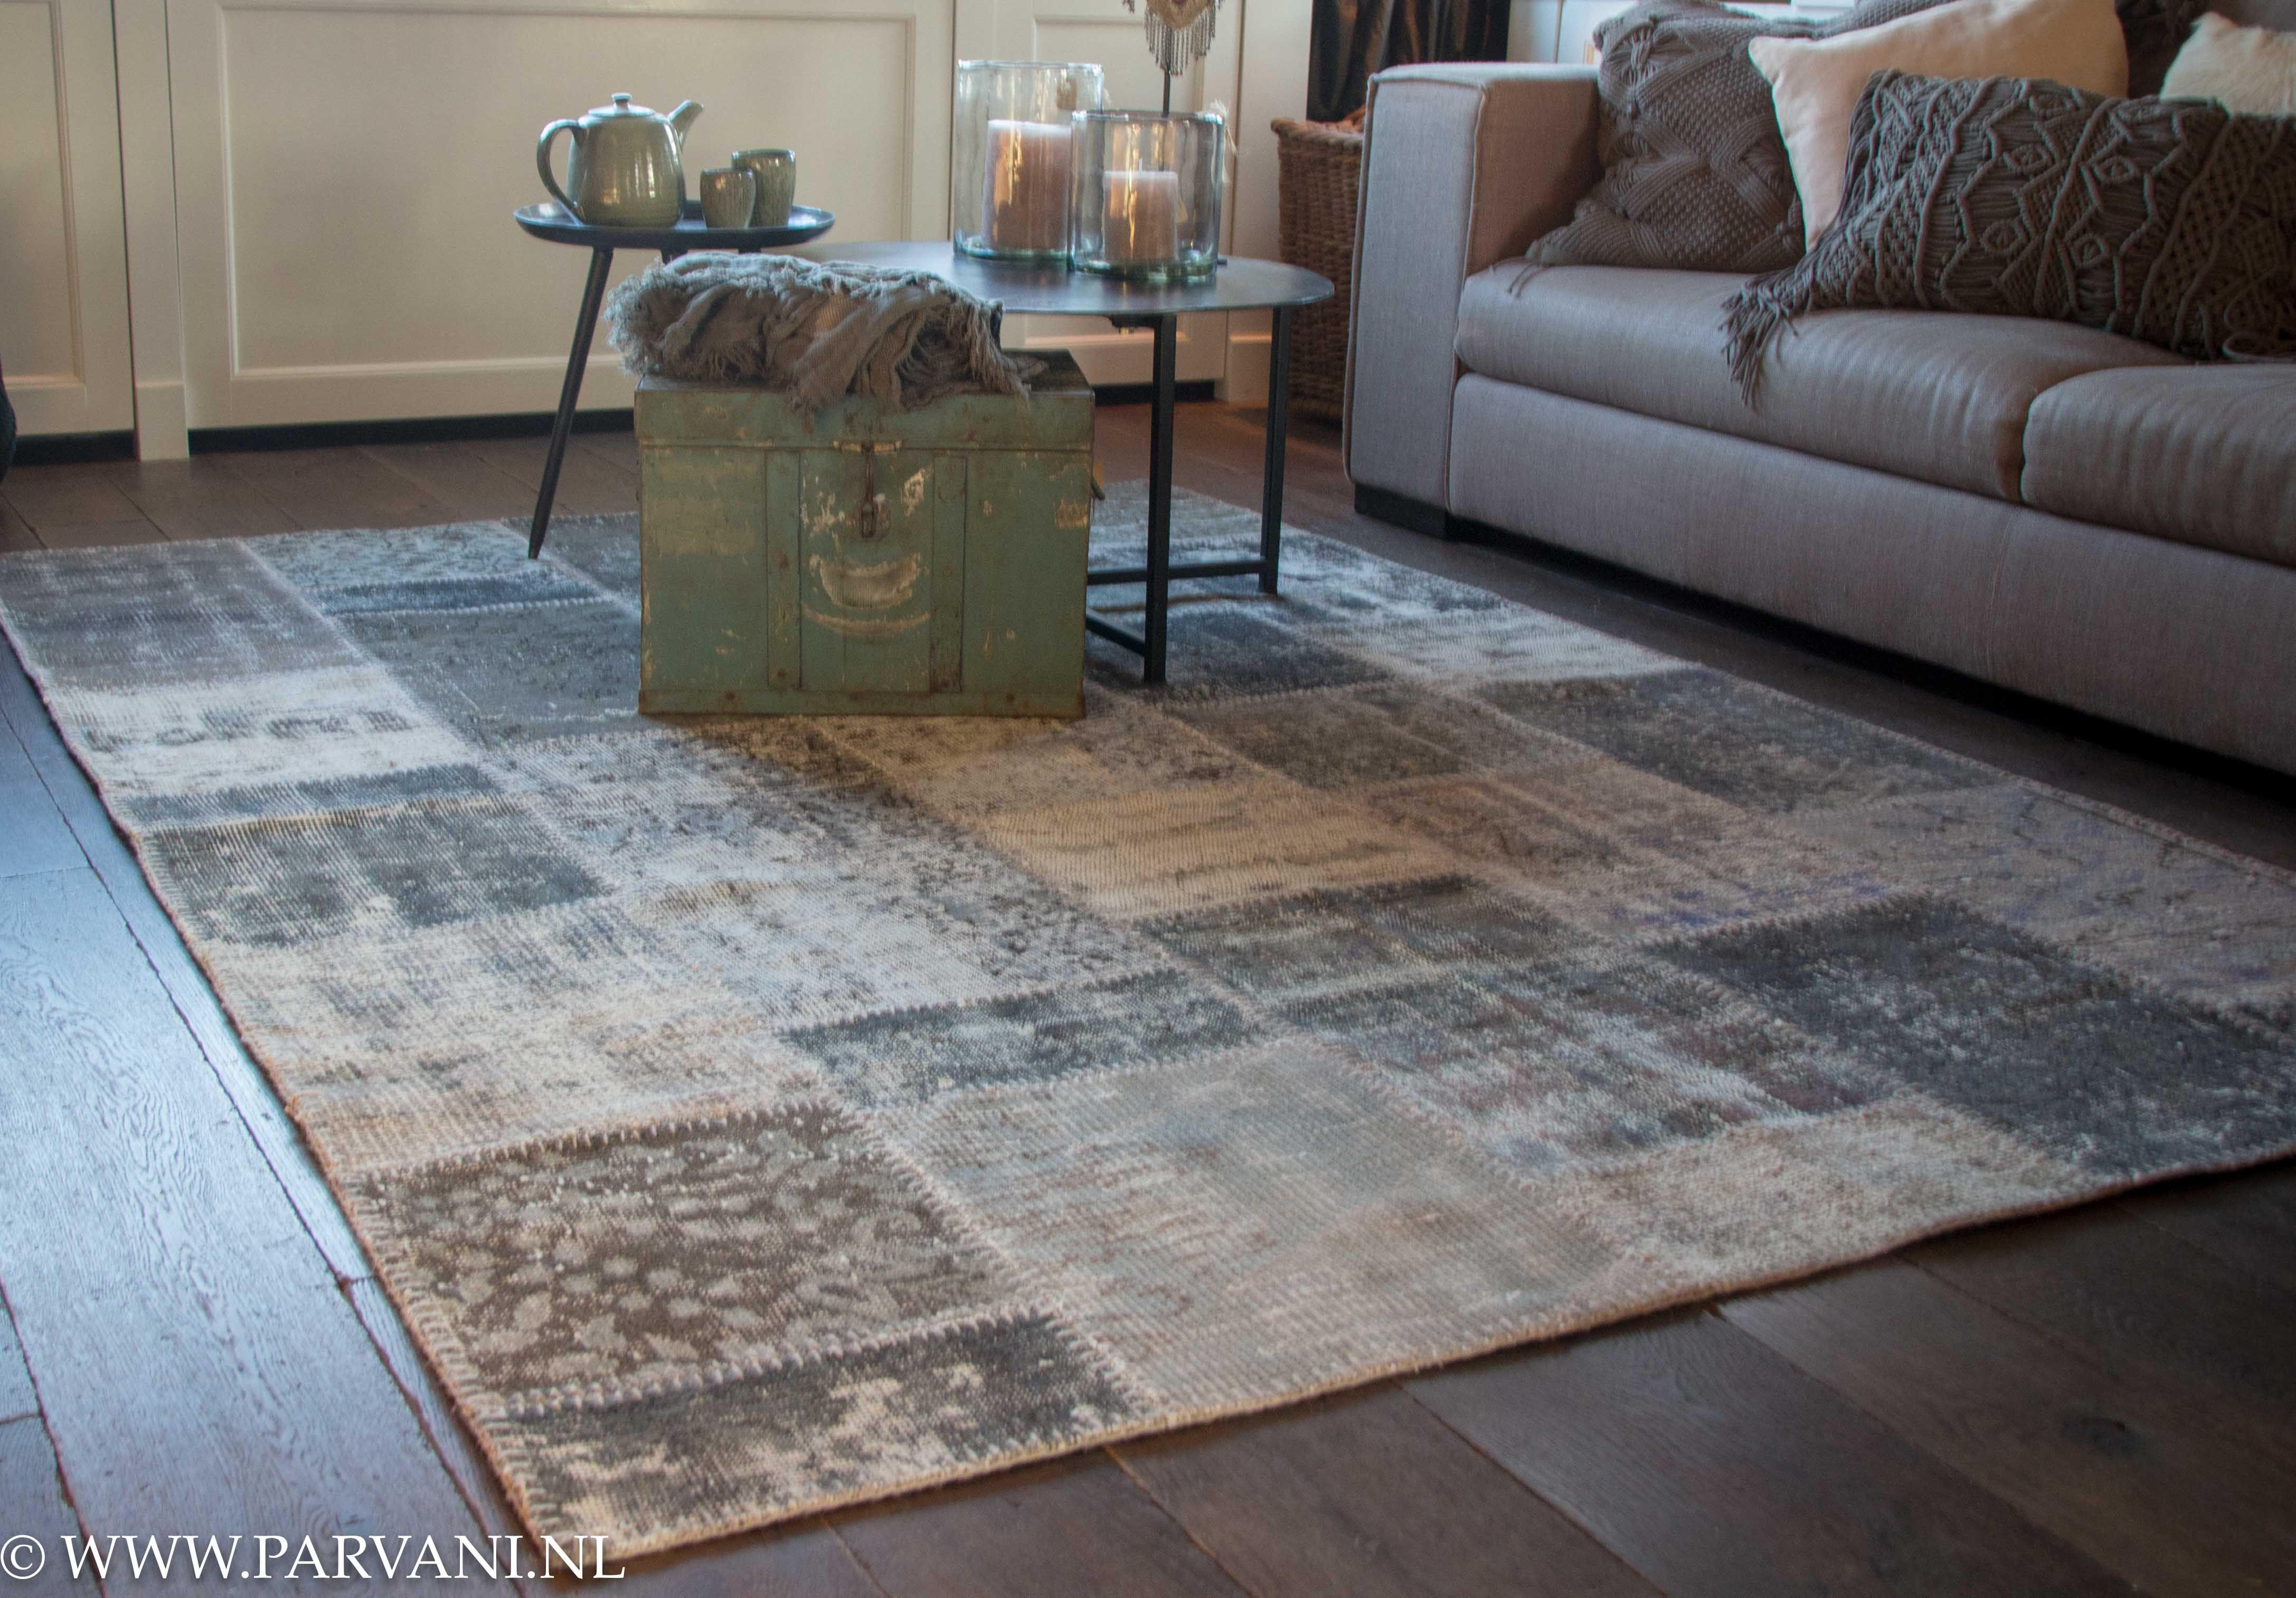 Parvani Vintage patchwork tapijt in mooie grijsgroene